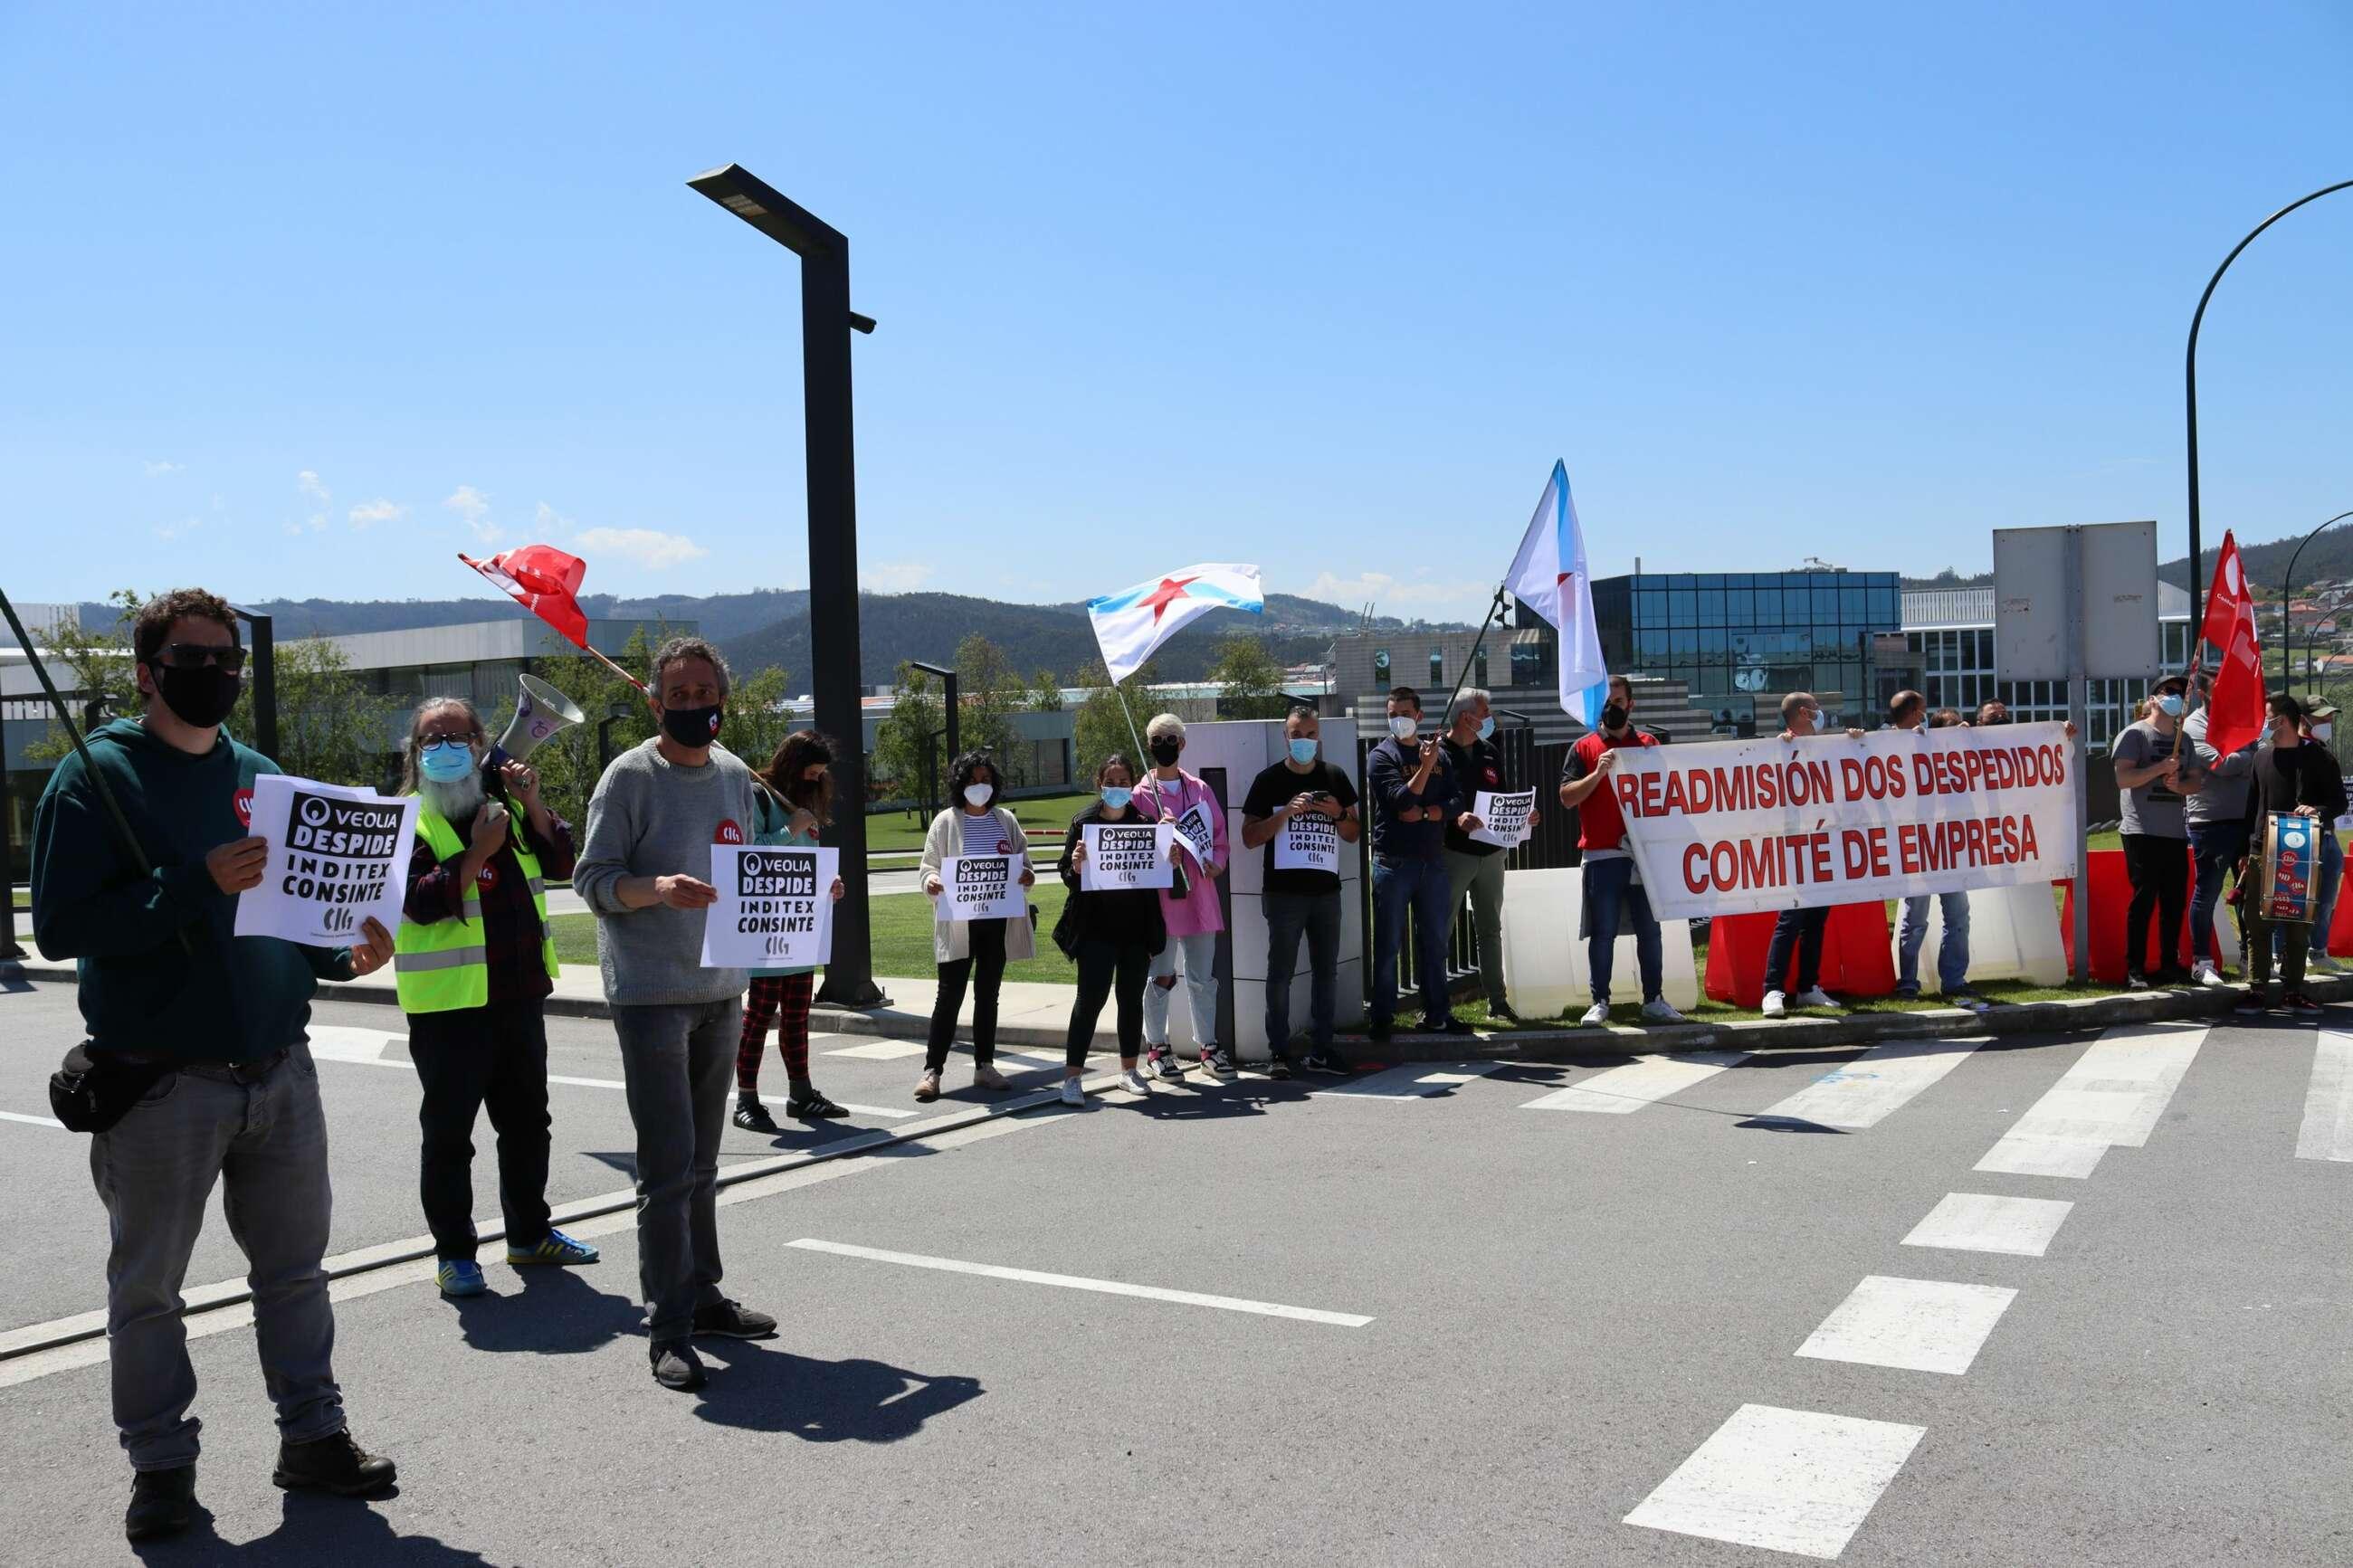 Fin a 19 días de huelga en Veolia, la subcontrata de Inditex